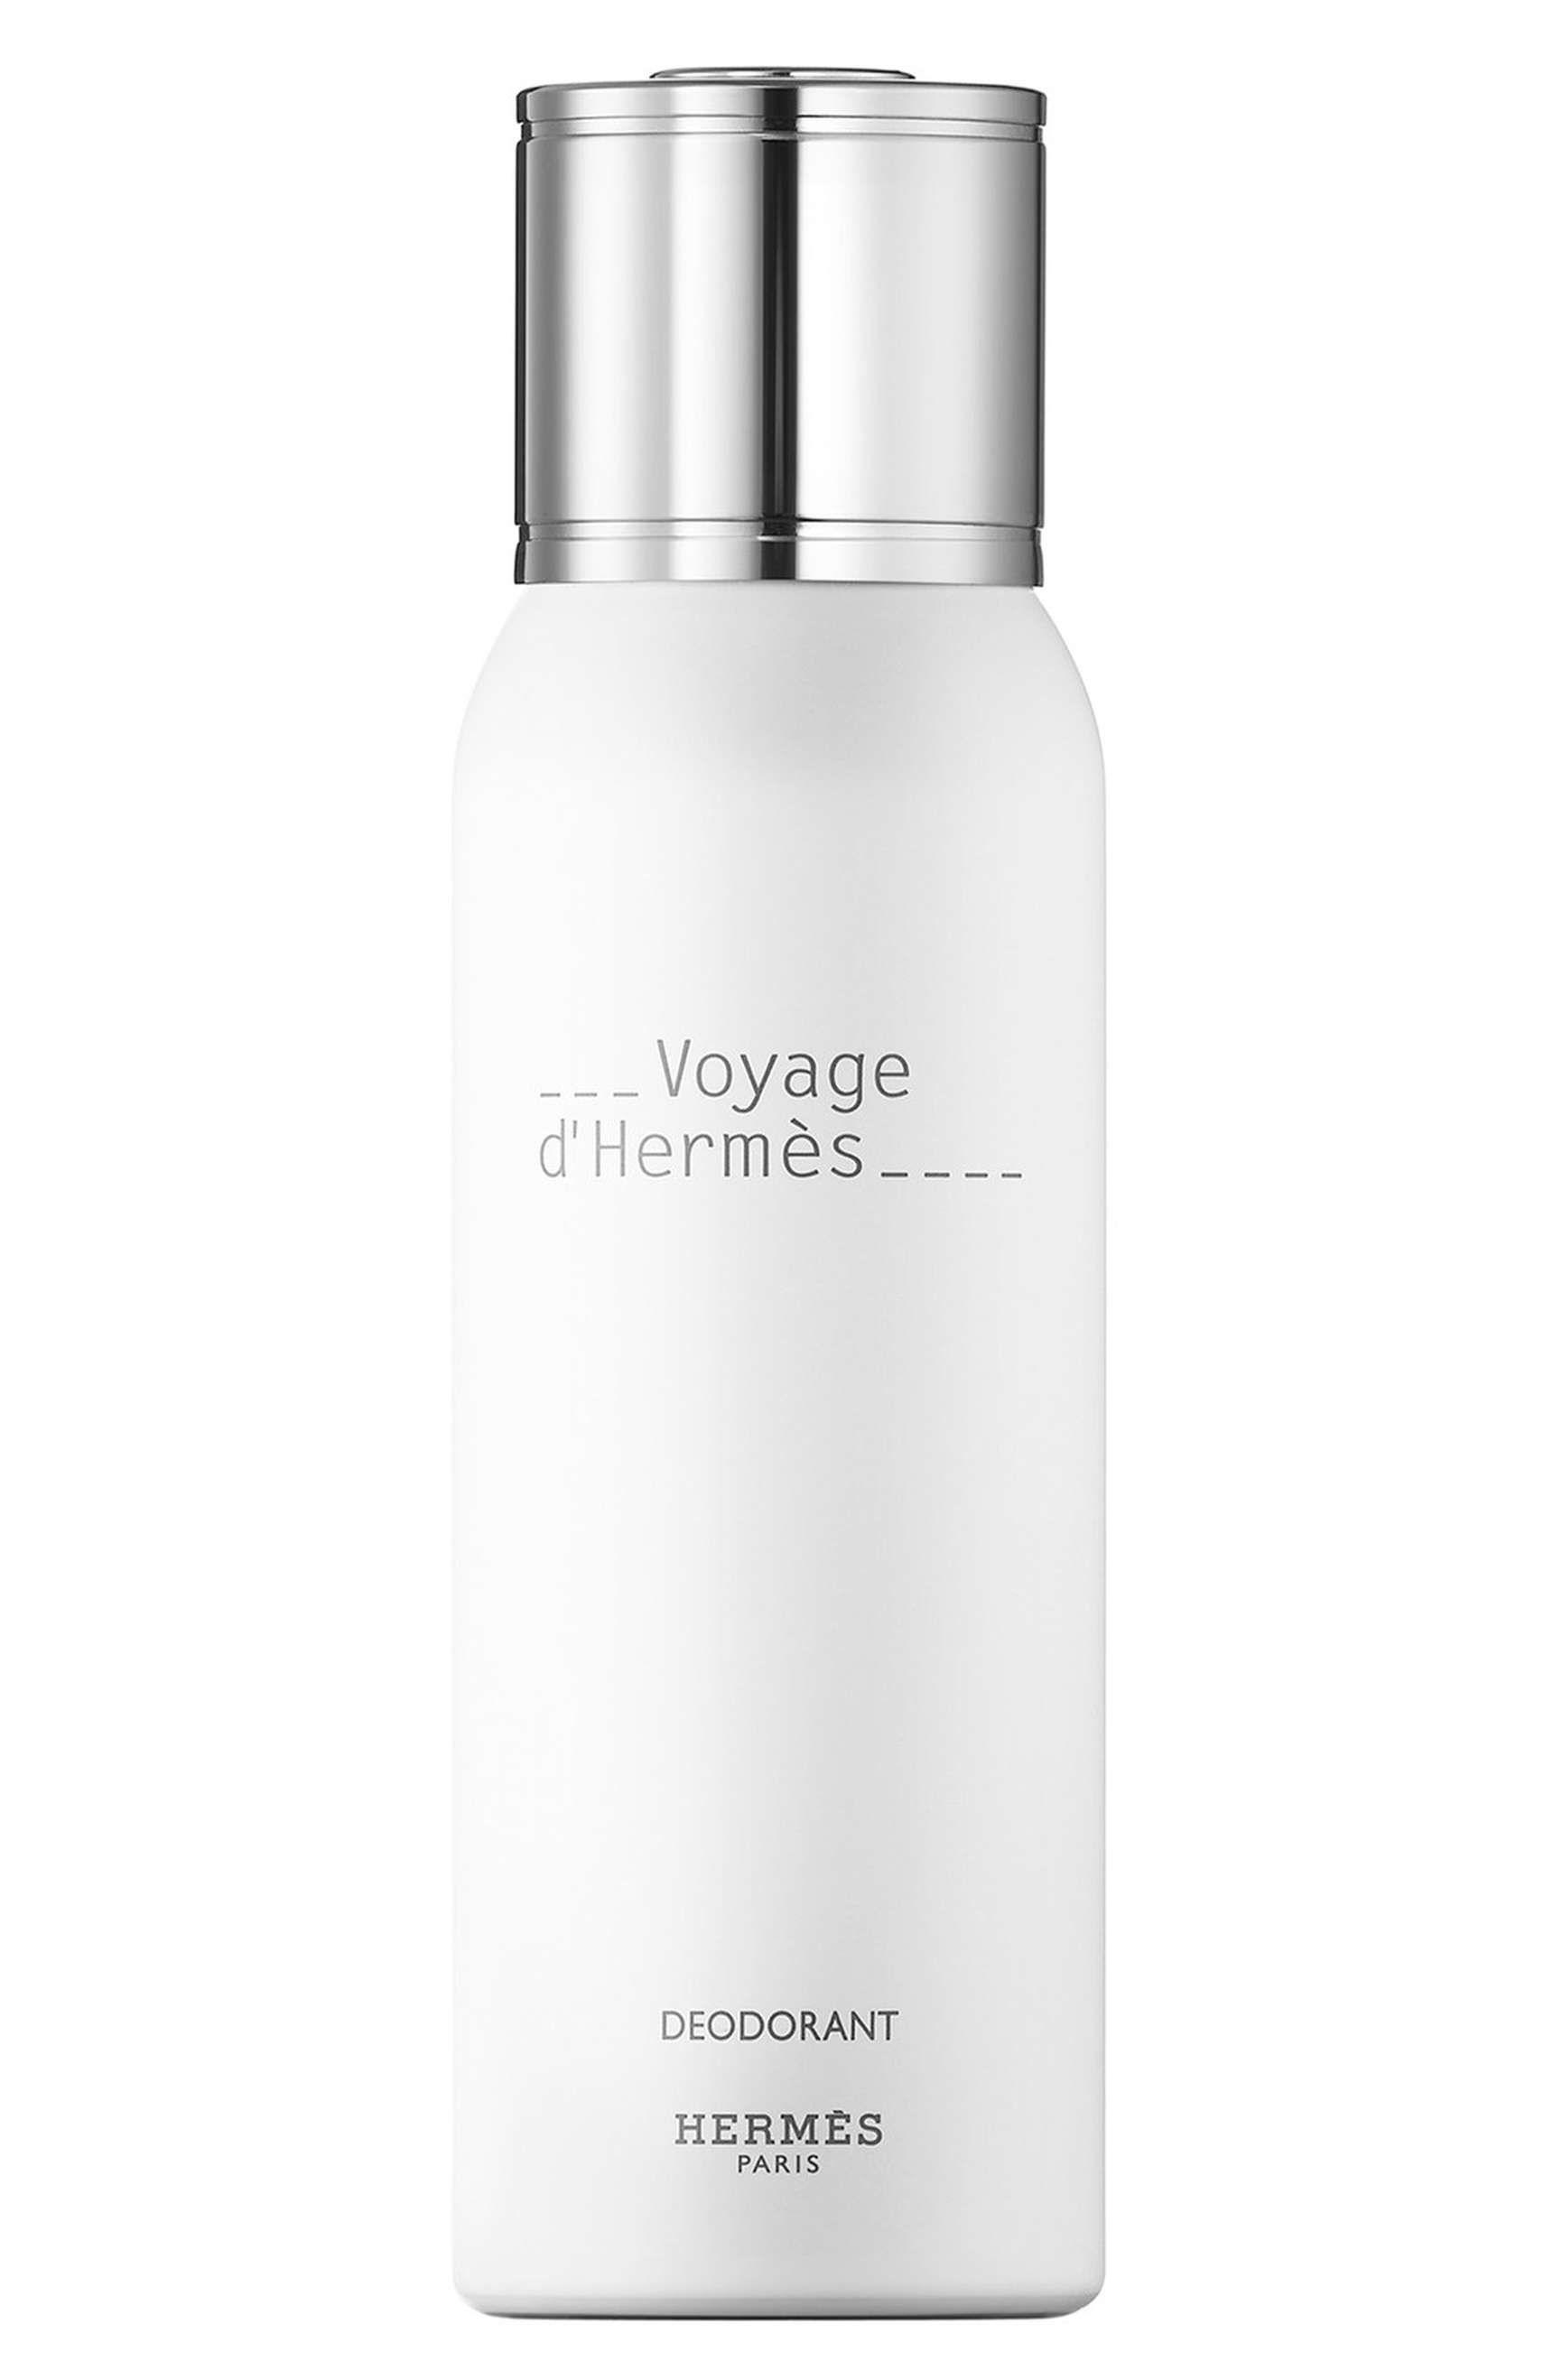 Best Smelling Body Spray For Men 2017 Mens Hermes Voyage